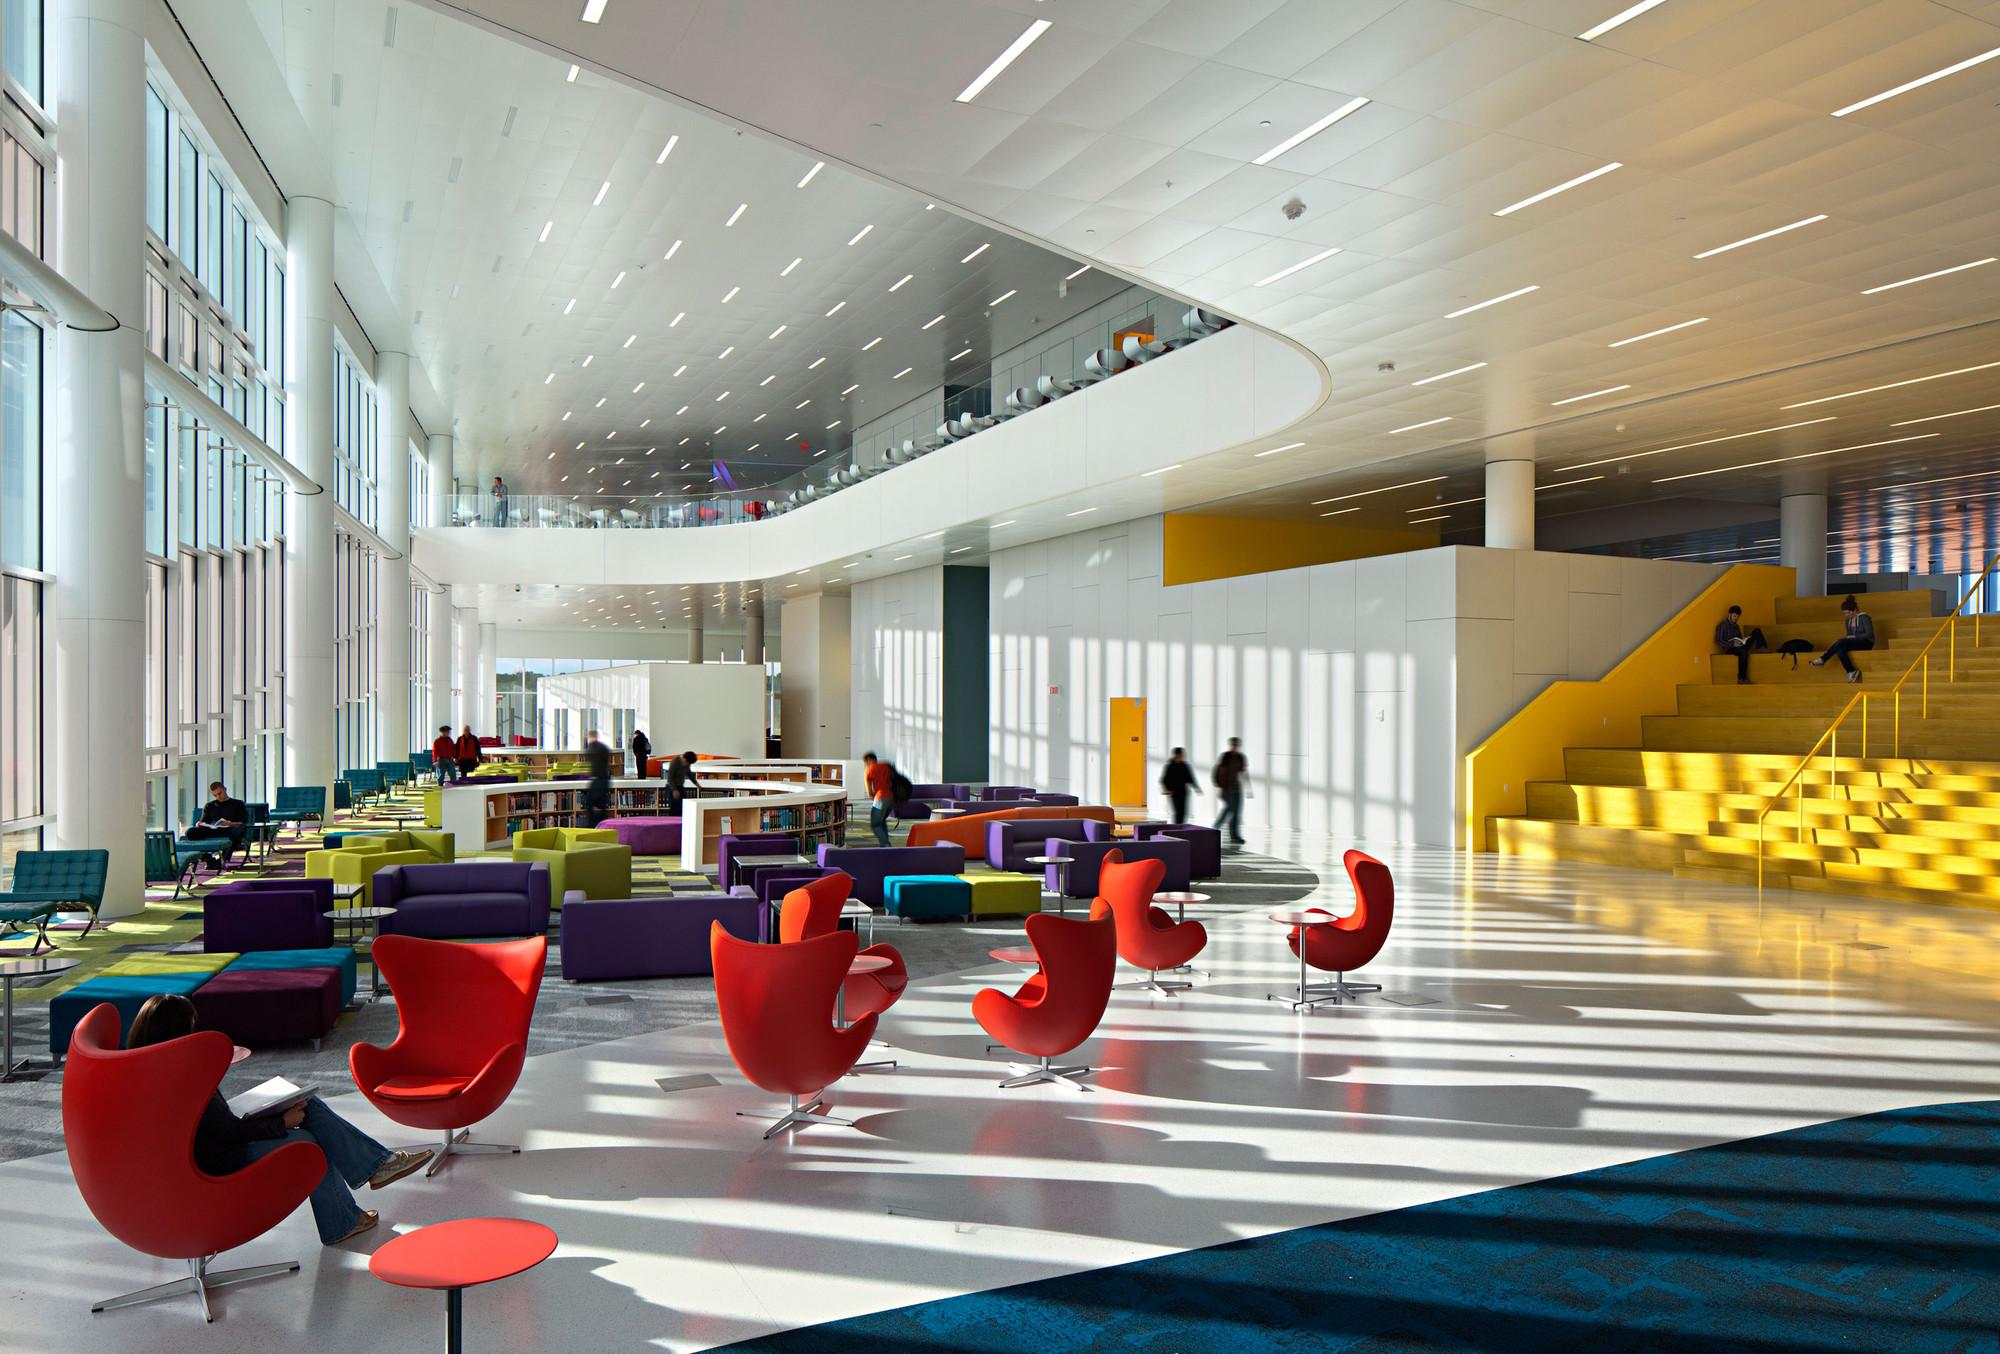 New York School Interior Design Requirements